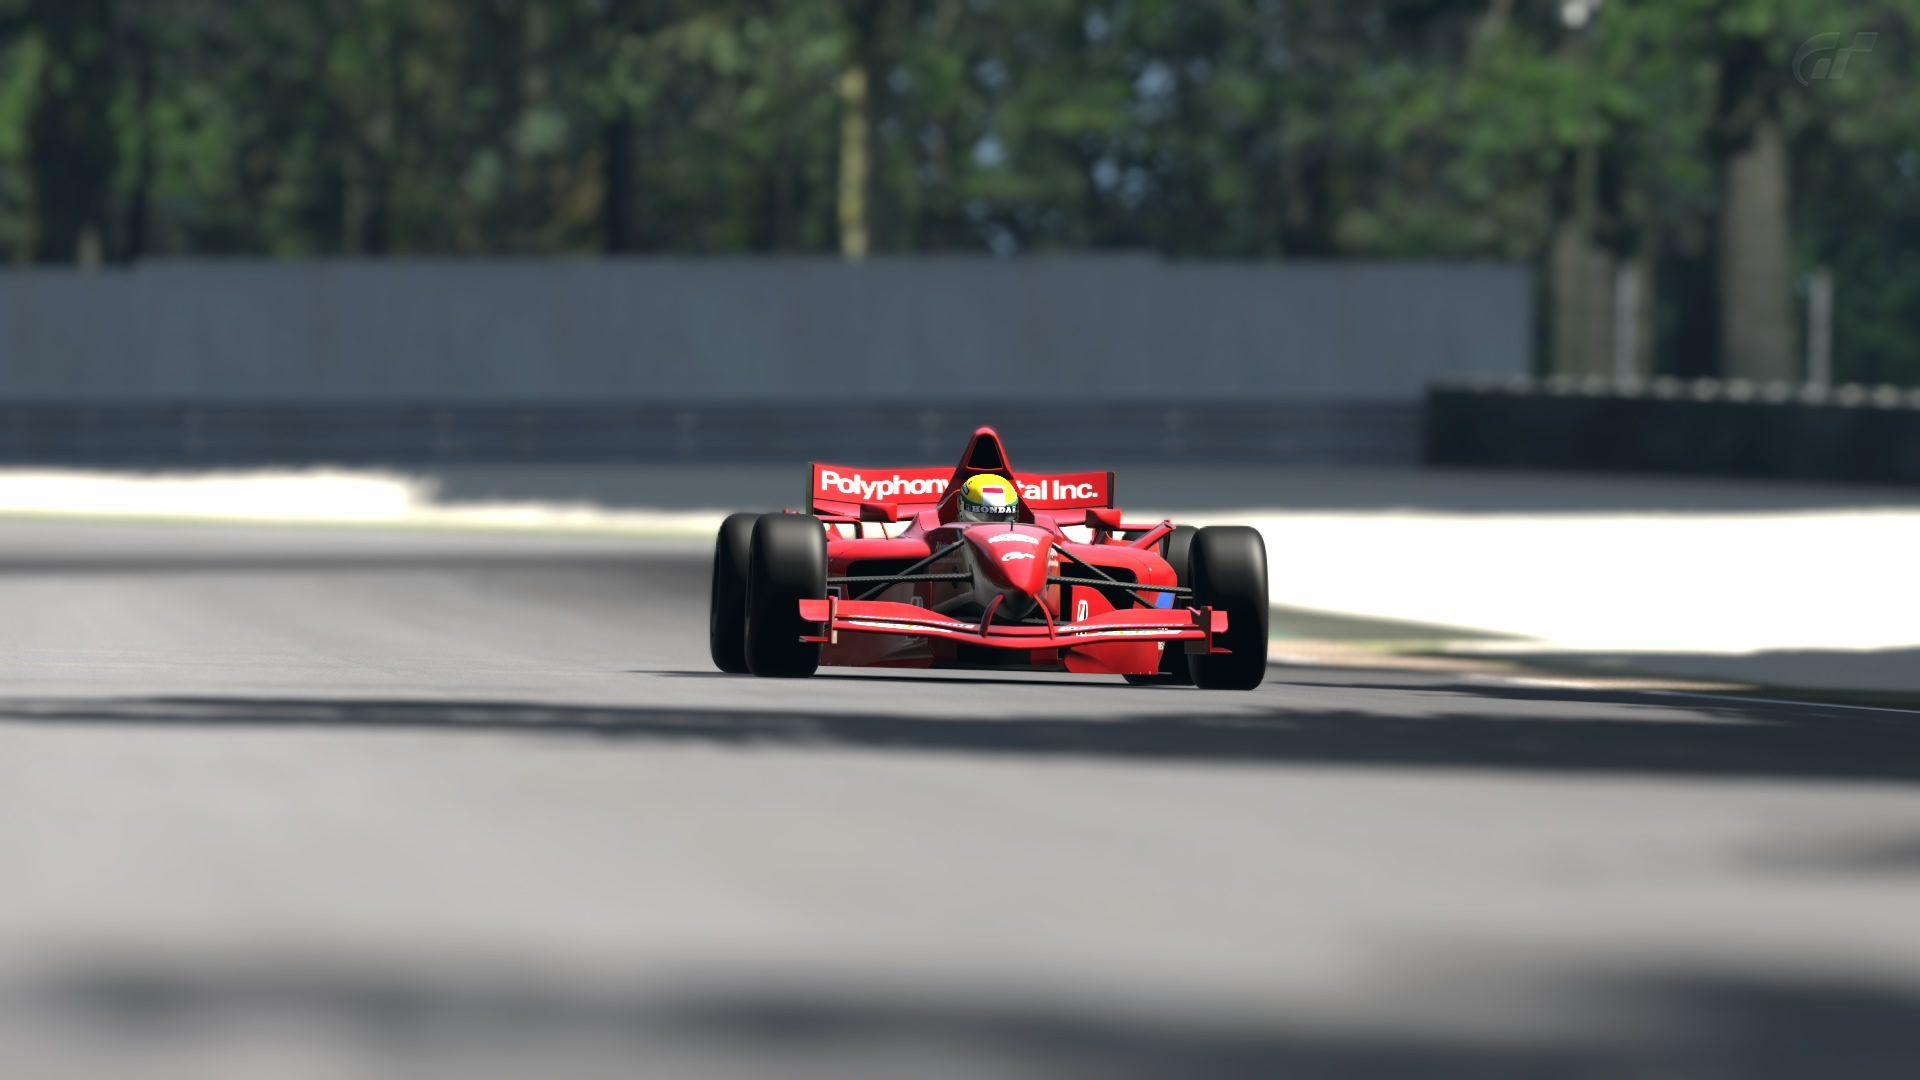 Autodromo Nazionale Monza_8.jpg